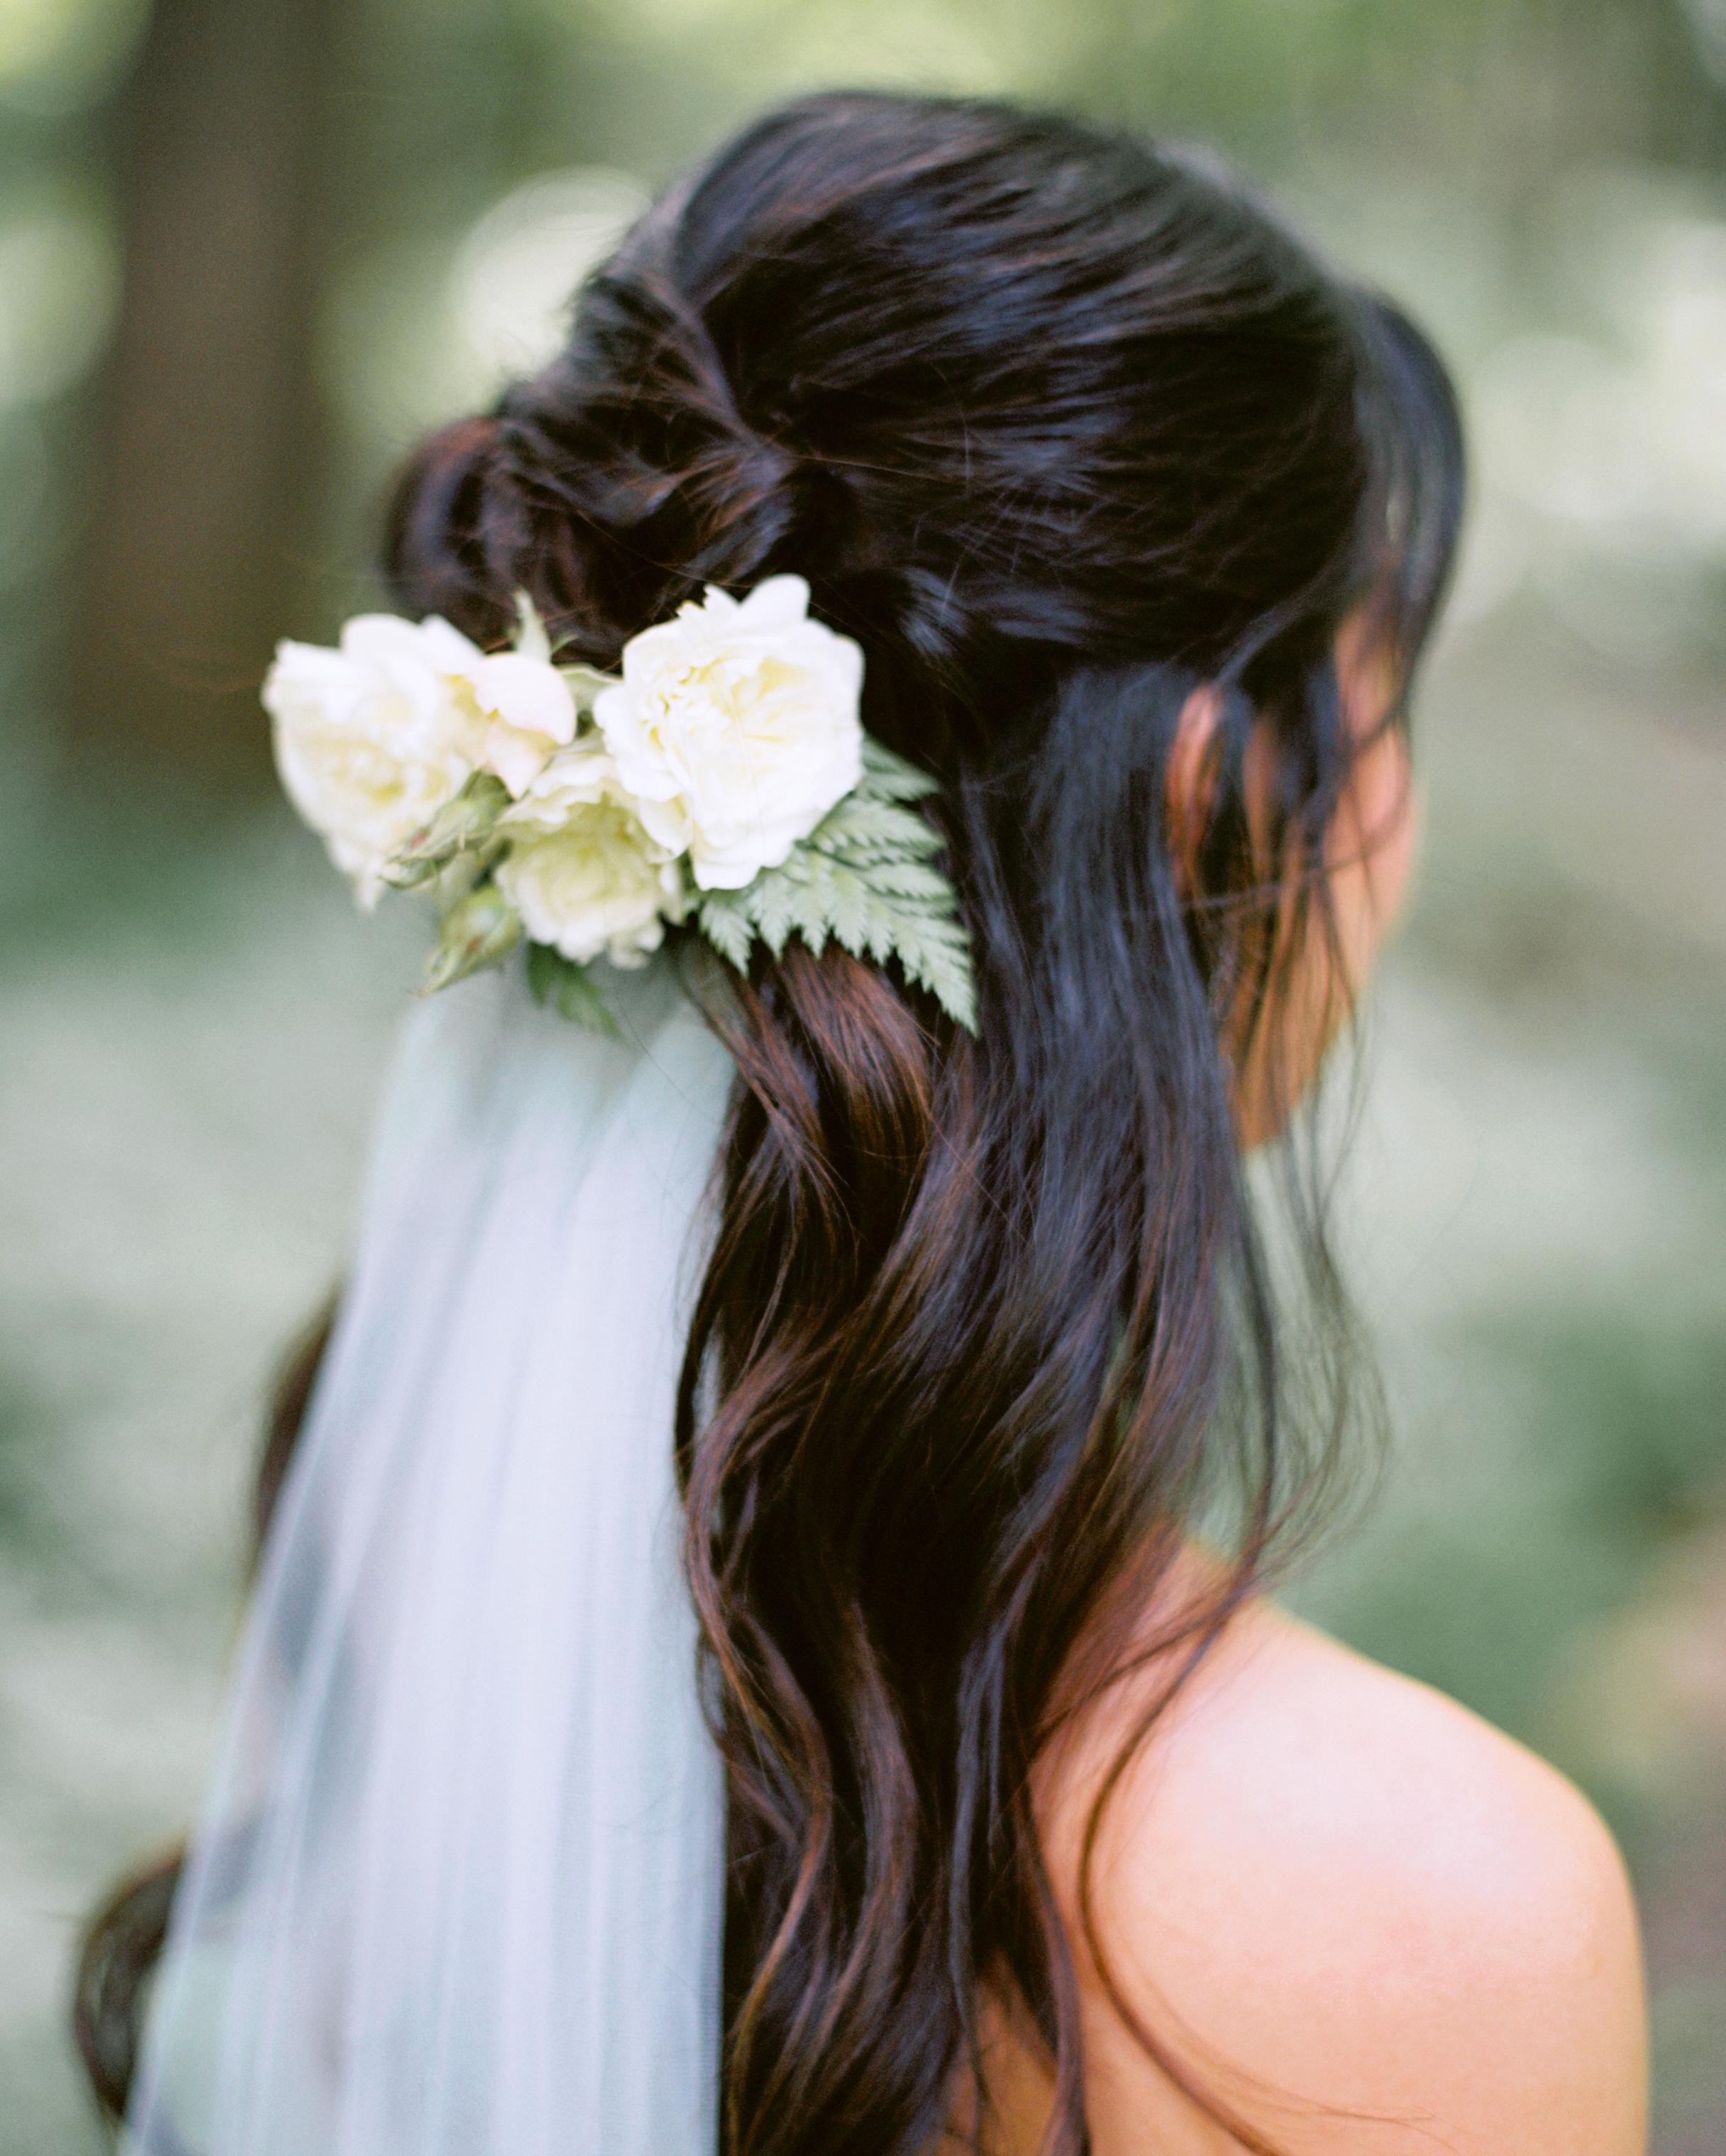 ally-adam-wedding-hair-012-s111818-0215.jpg